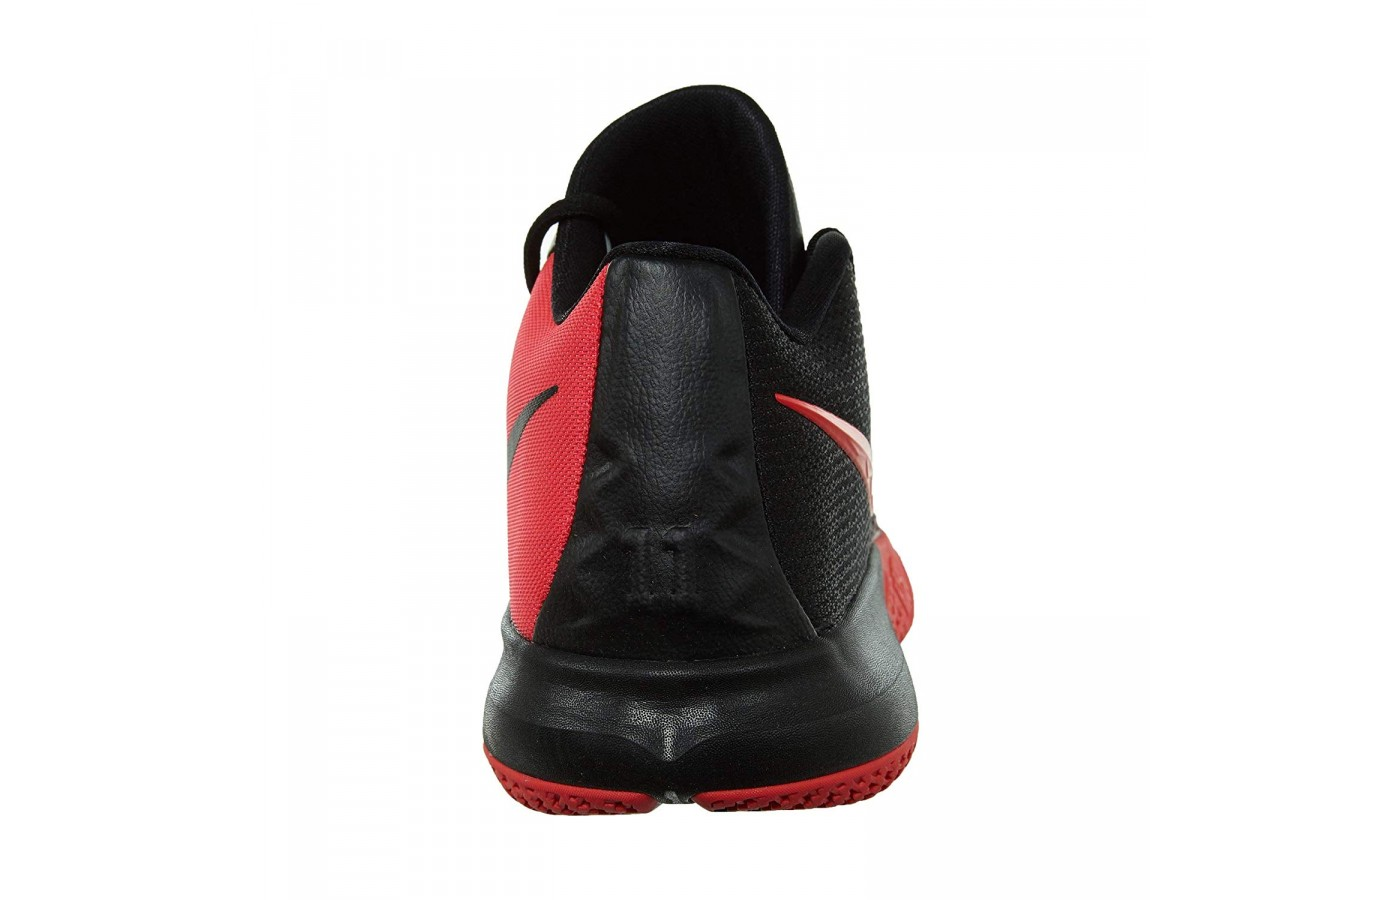 Nike Kyrie Flytrap Heel